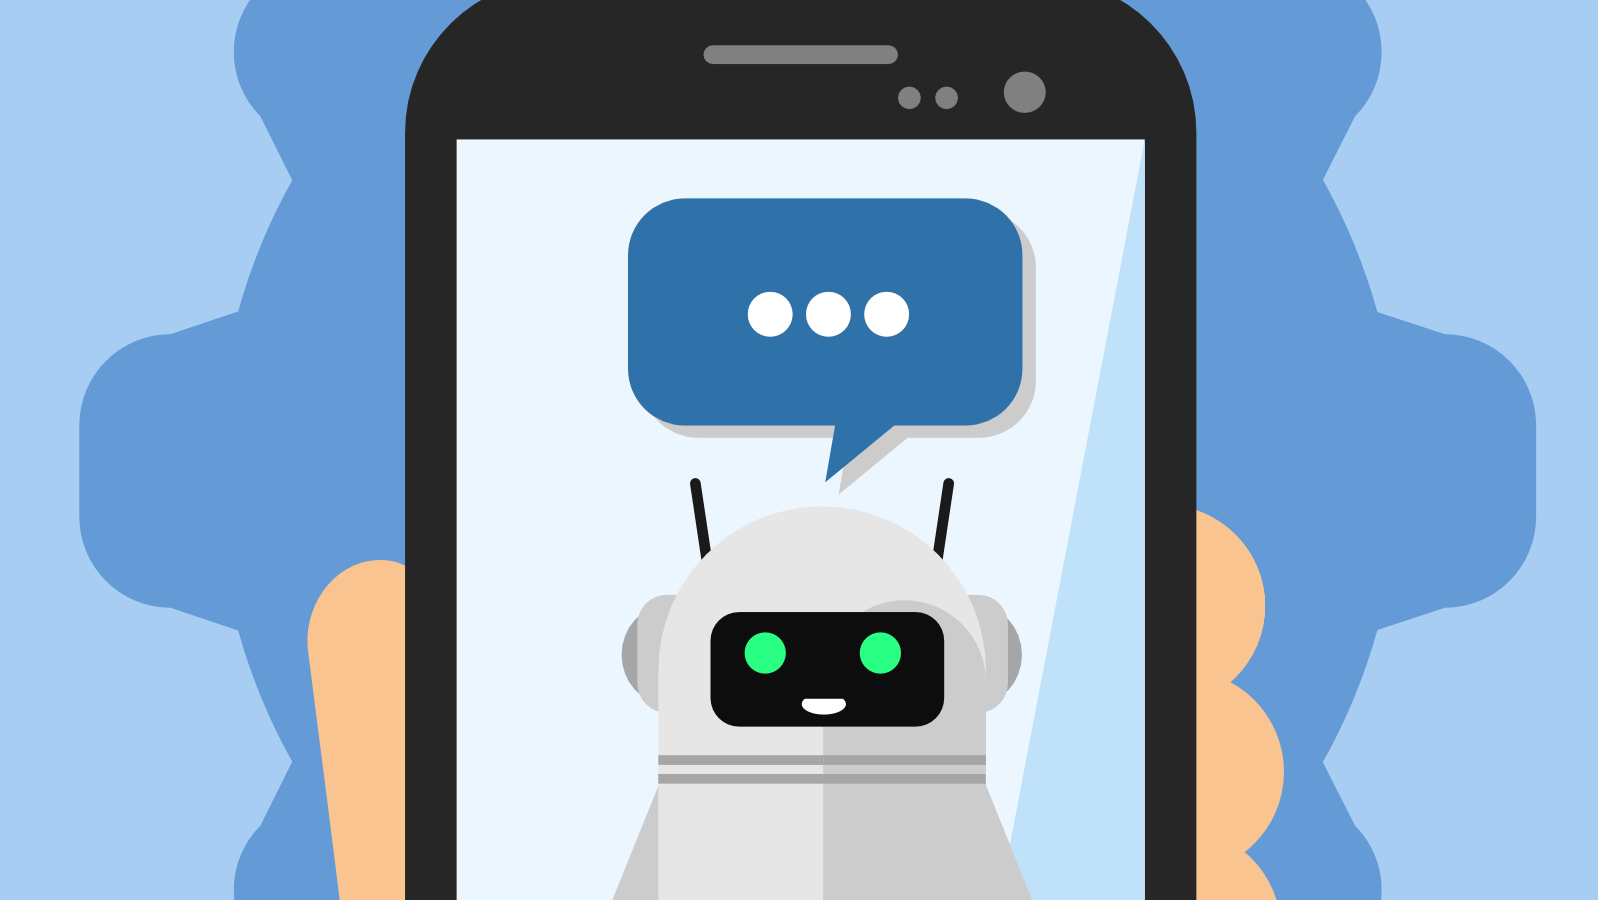 iphone mobile application development